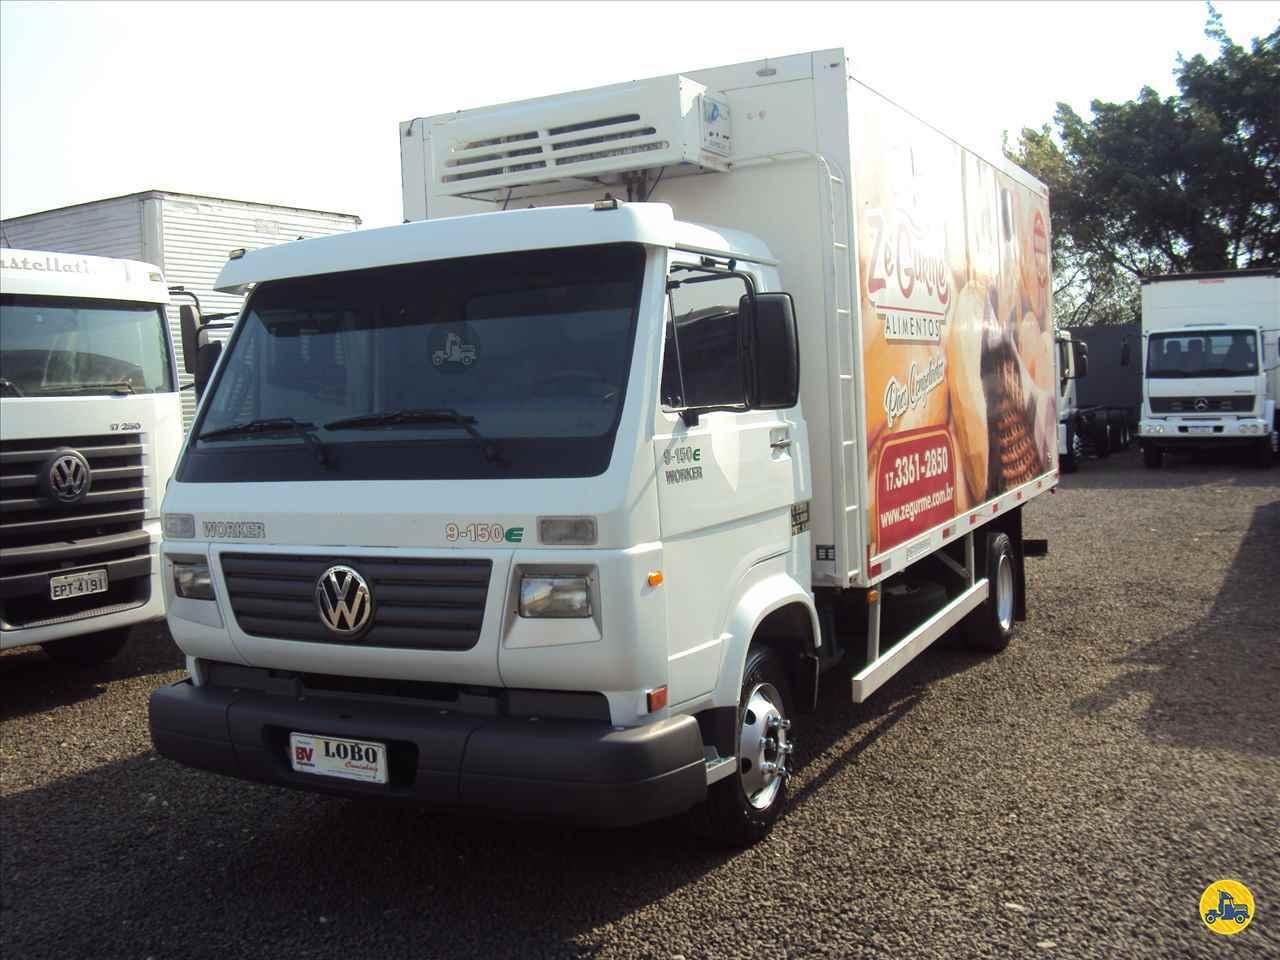 CAMINHAO VOLKSWAGEN VW 9150 Baú Frigorífico 3/4 4x2 Lobo Caminhões AMERICANA SÃO PAULO SP